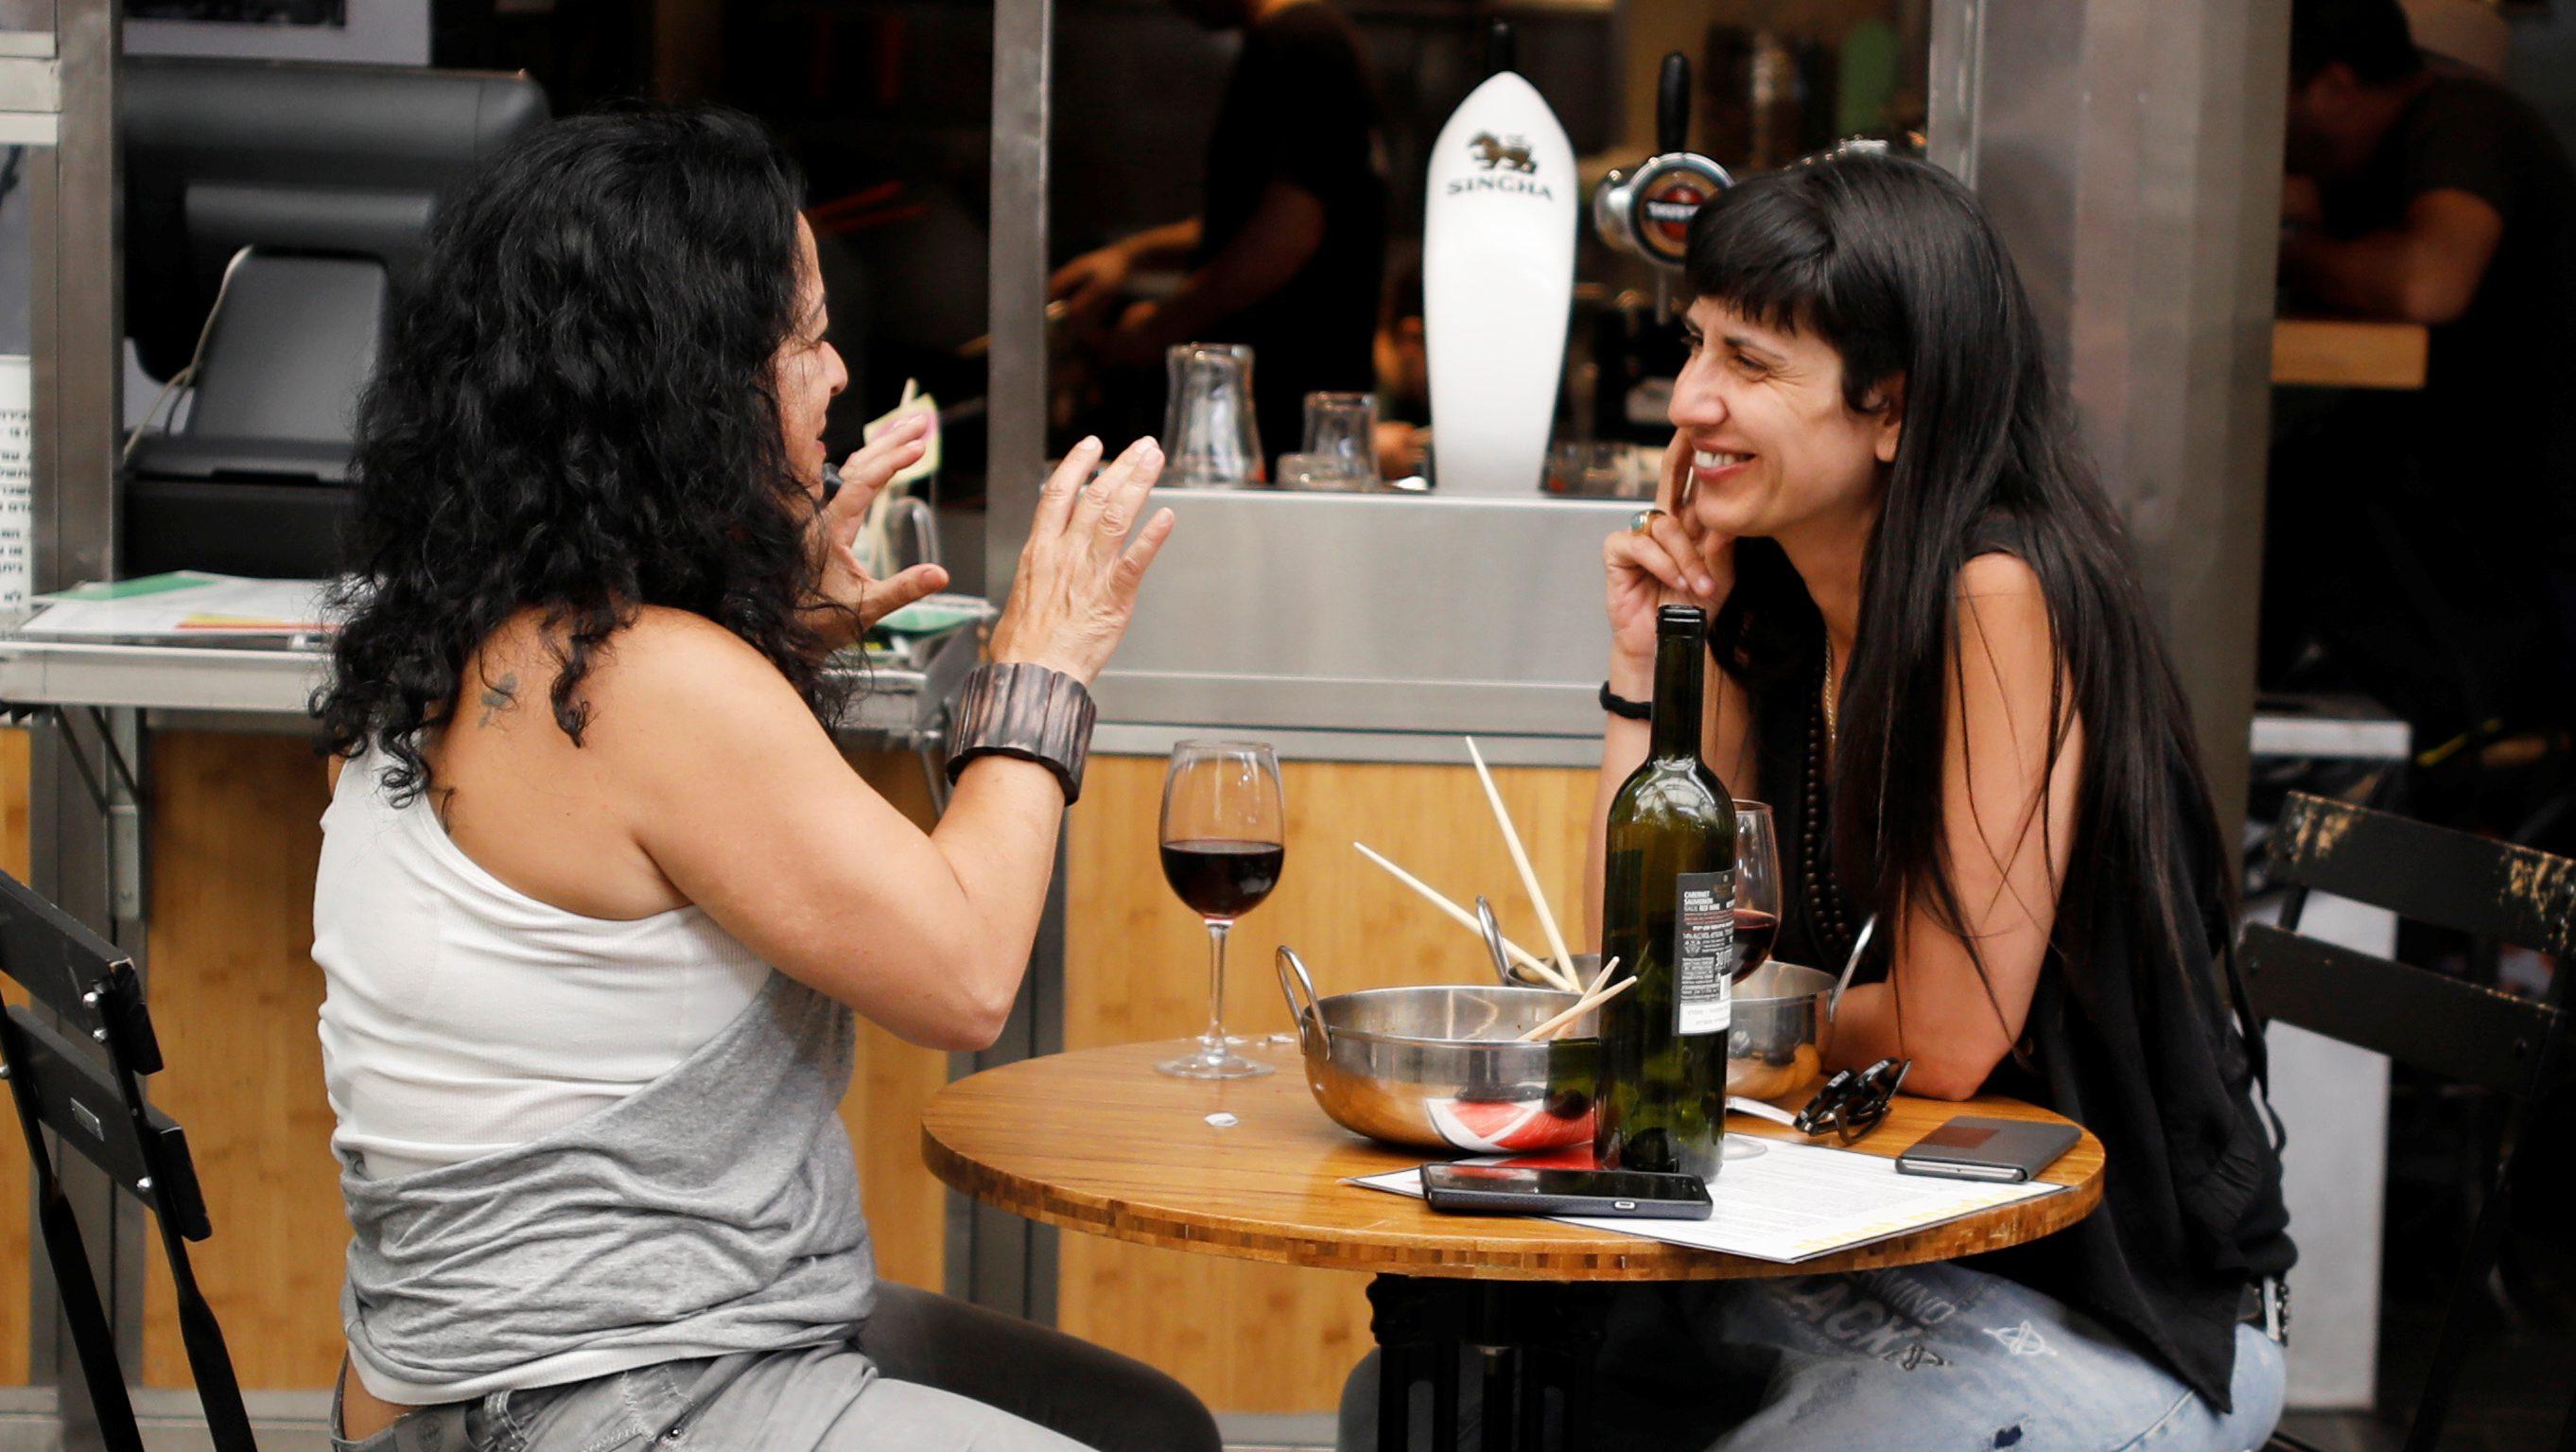 two women at an outdoor bar